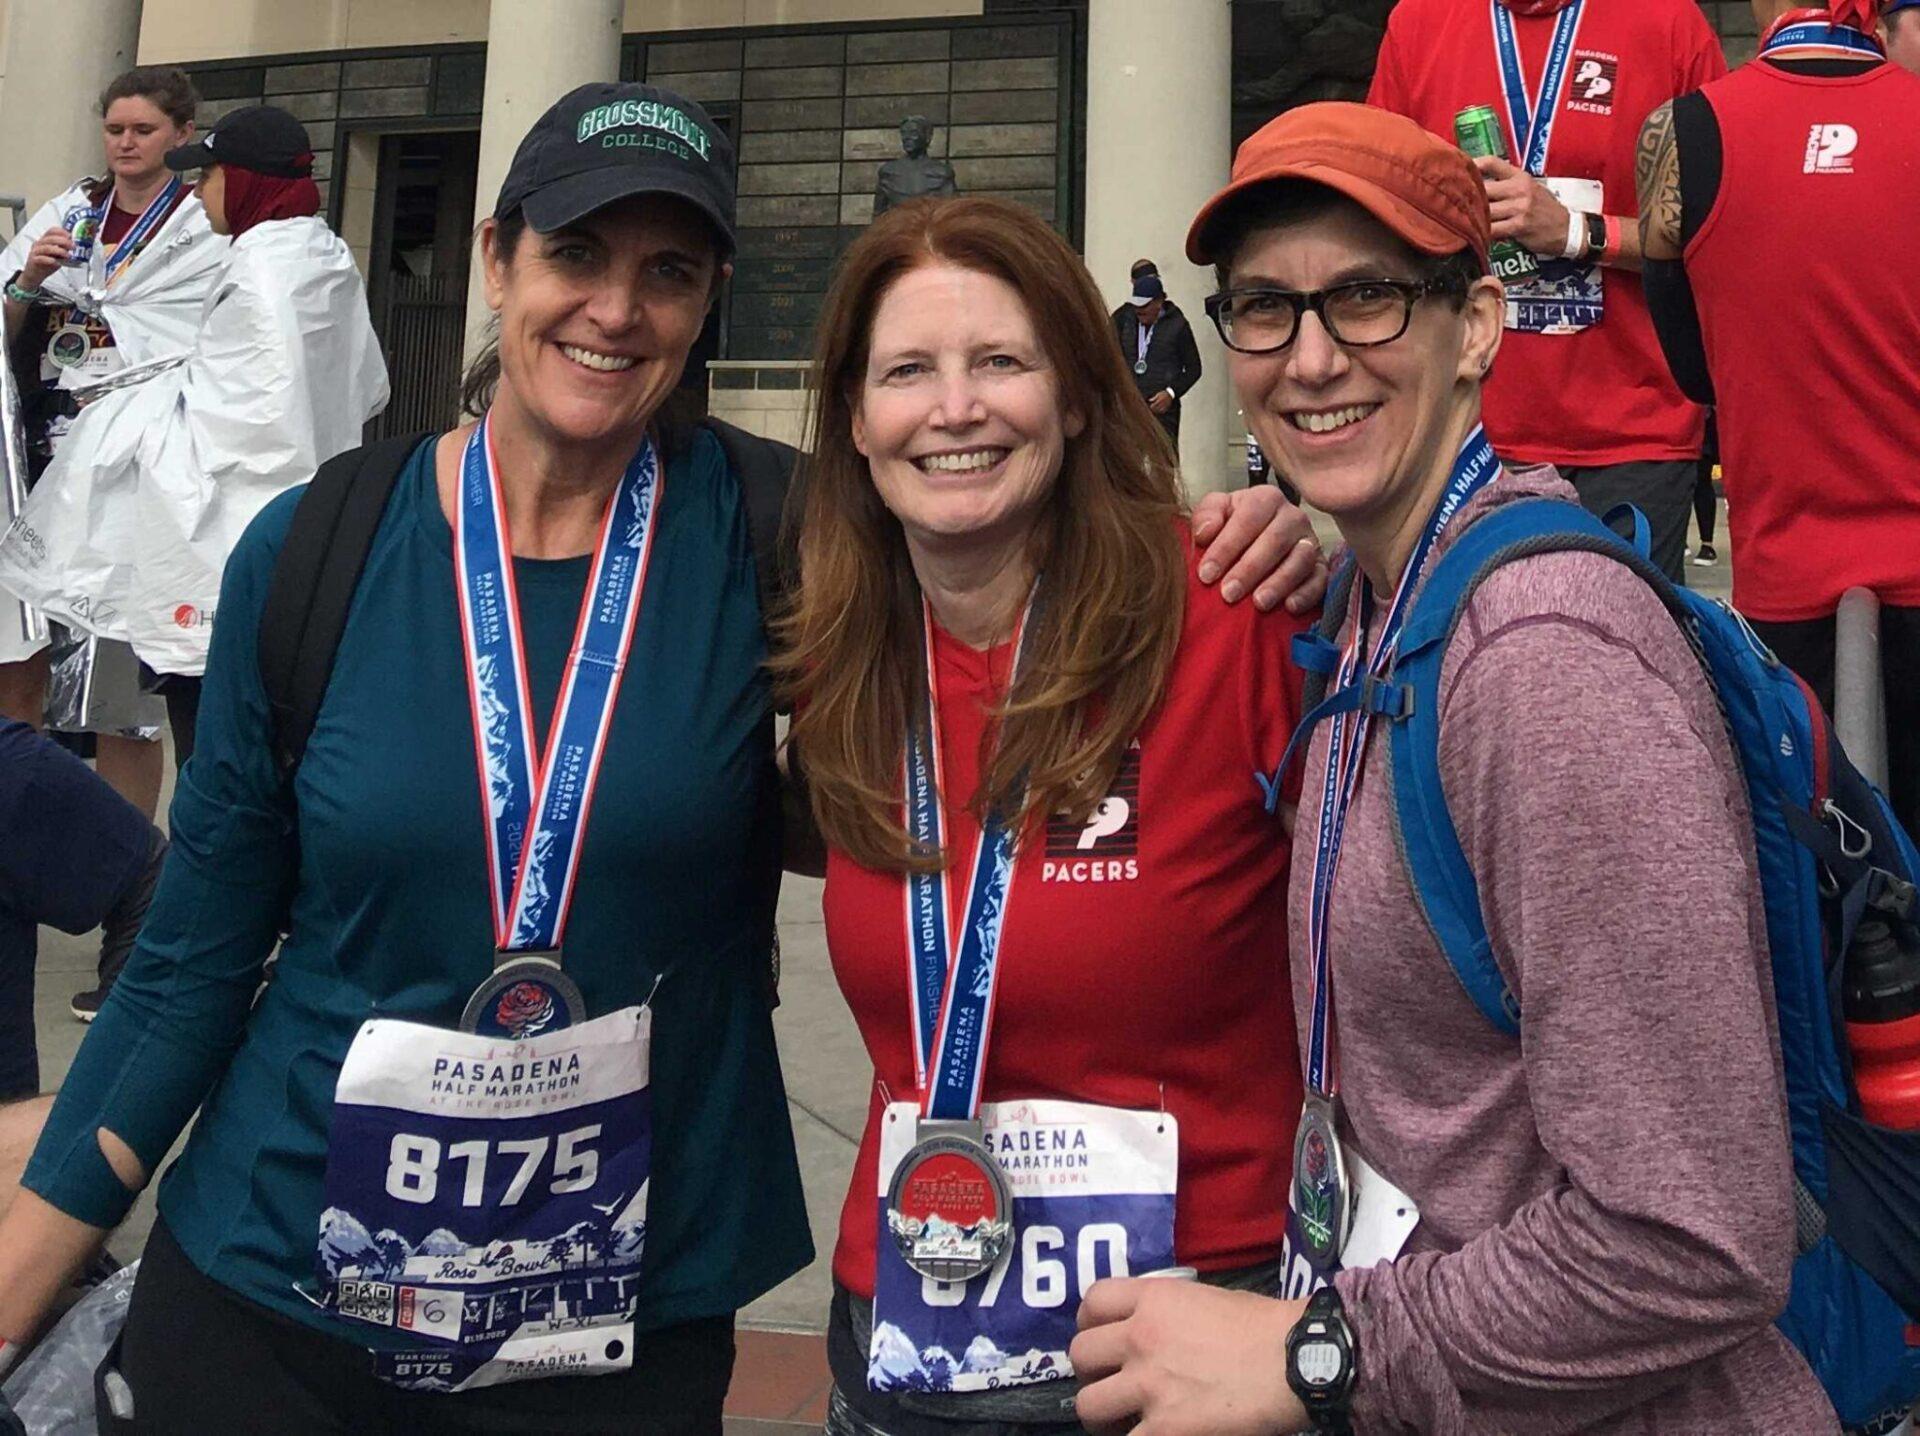 A friend group smiling before a marathon.